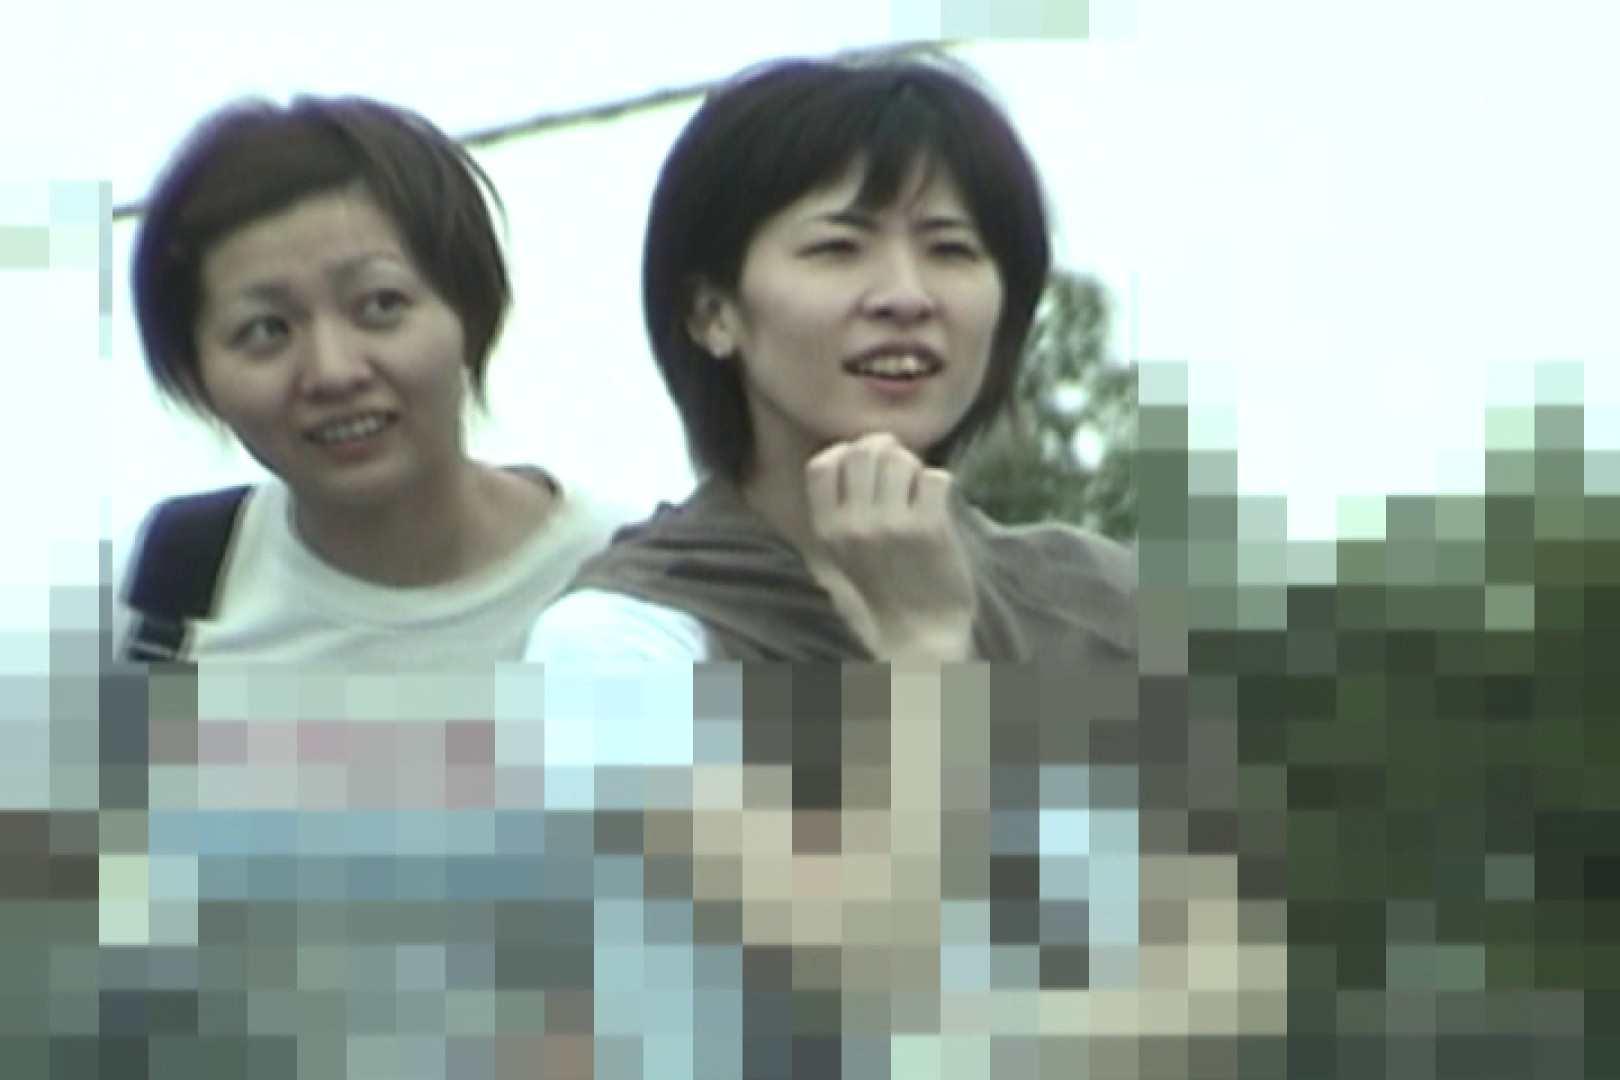 Aquaな露天風呂Vol.793 盗撮映像  72Pix 4